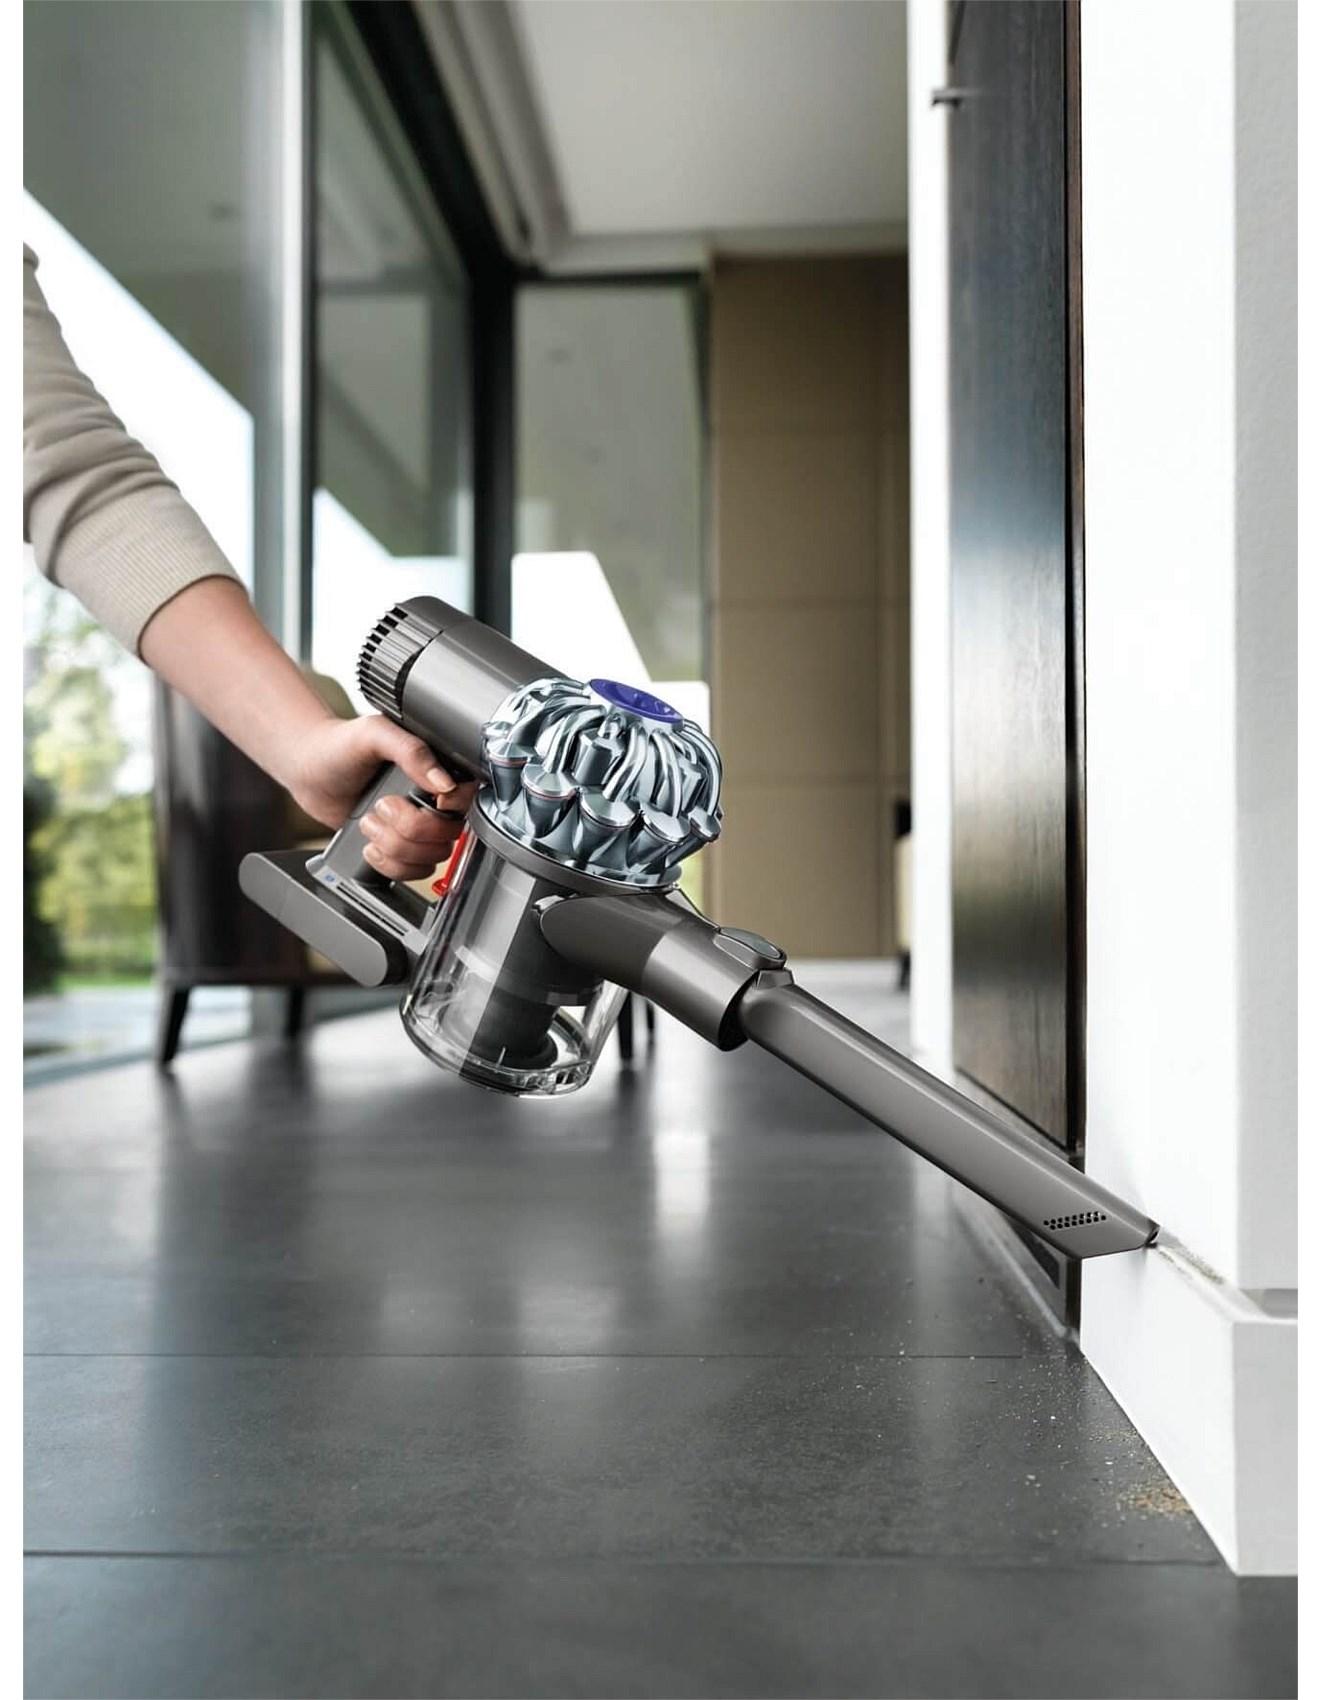 dyson vacuum cleaners fans hair dryers more david jones v6 trigger handheld vacuum cleaner. Black Bedroom Furniture Sets. Home Design Ideas